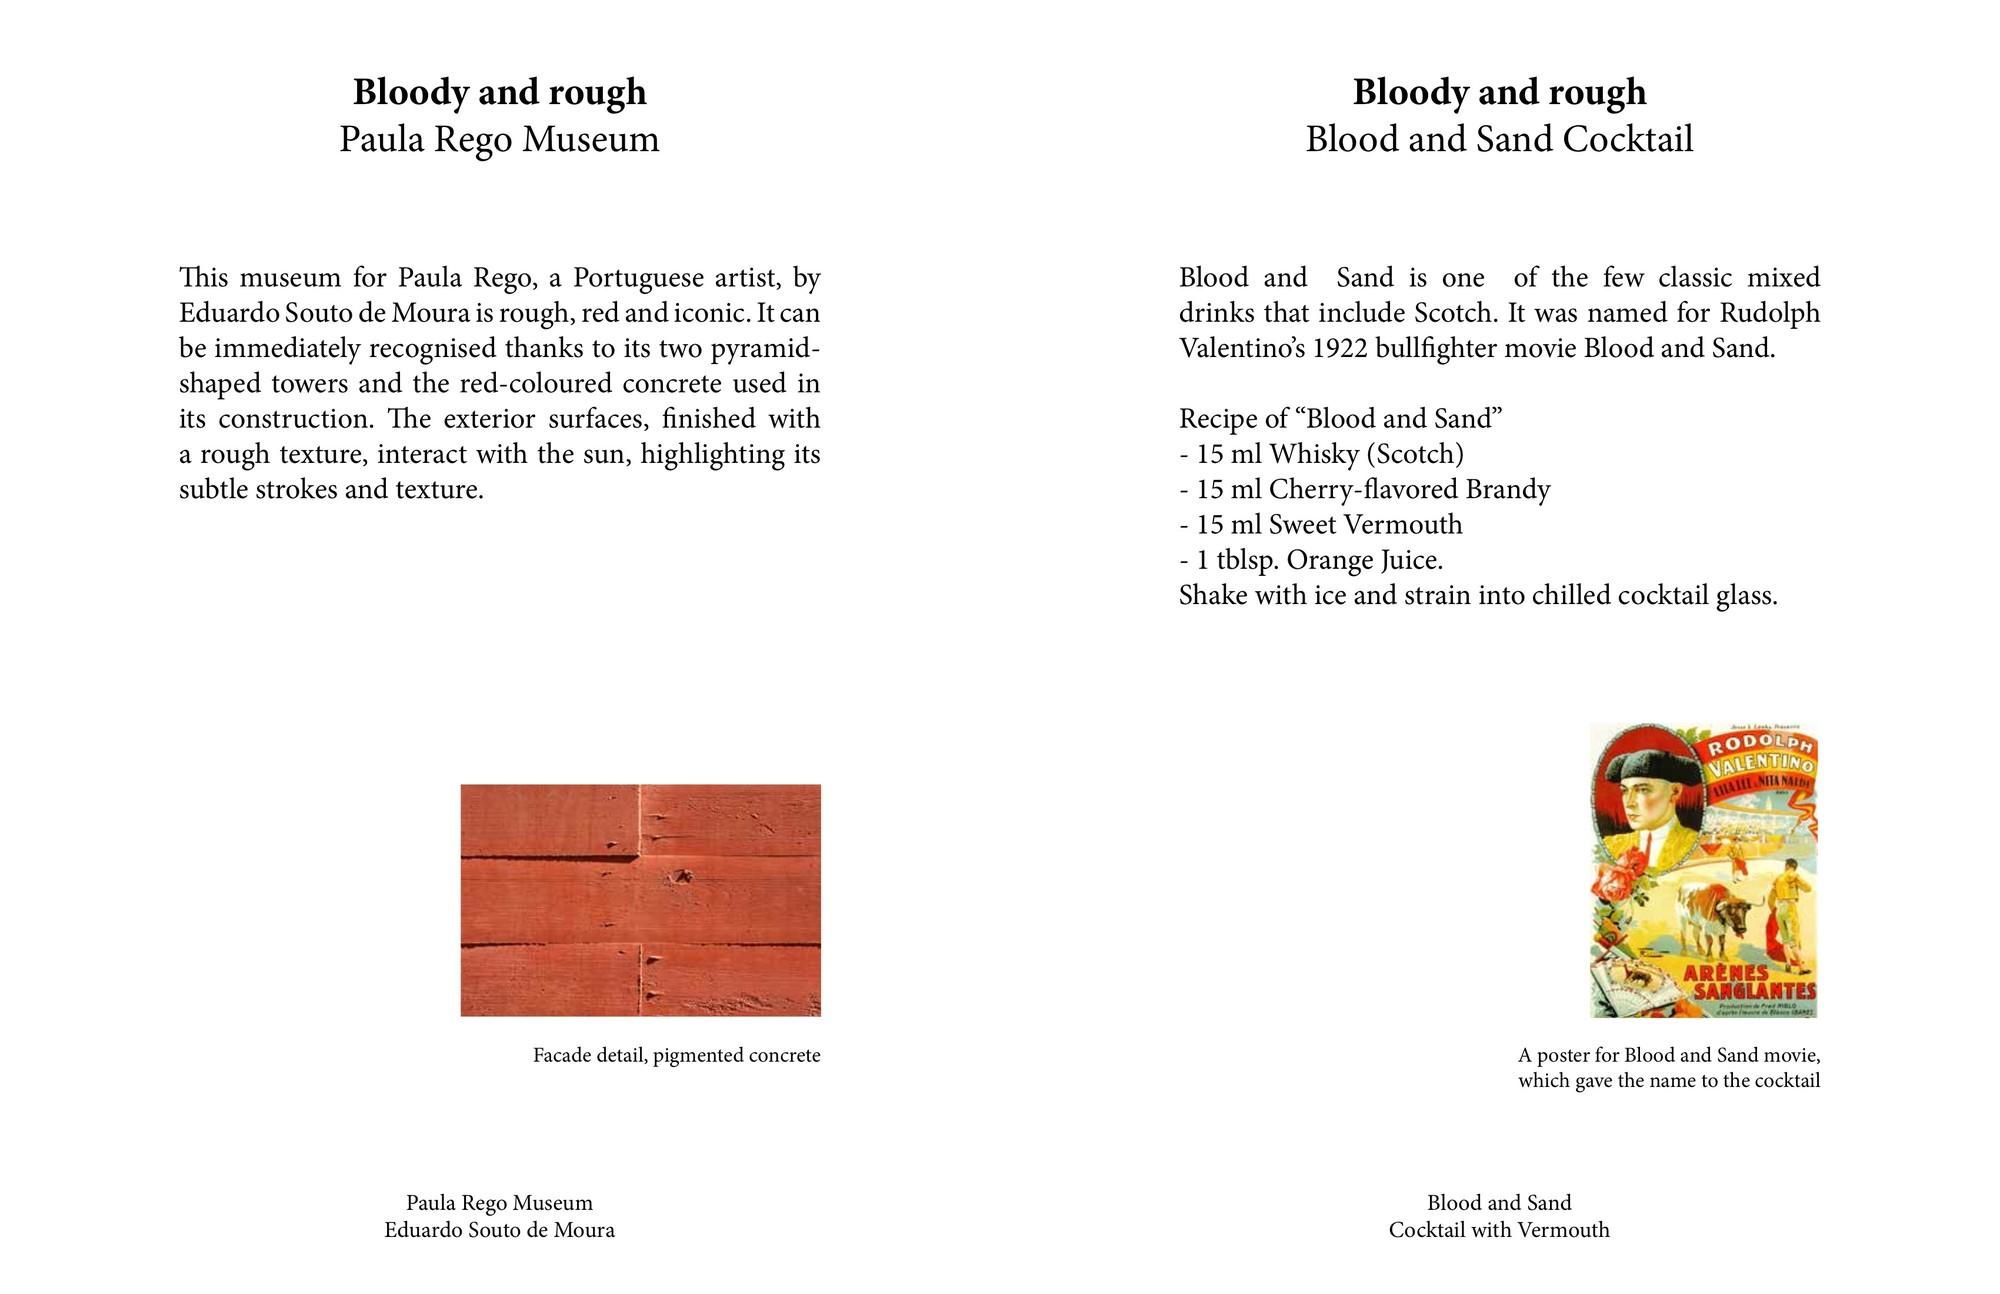 Casa de las historias de Paula Rego por Eduardo Souto de Moura / Blood and Sand. Imágen cortesía de Kosmos Architects